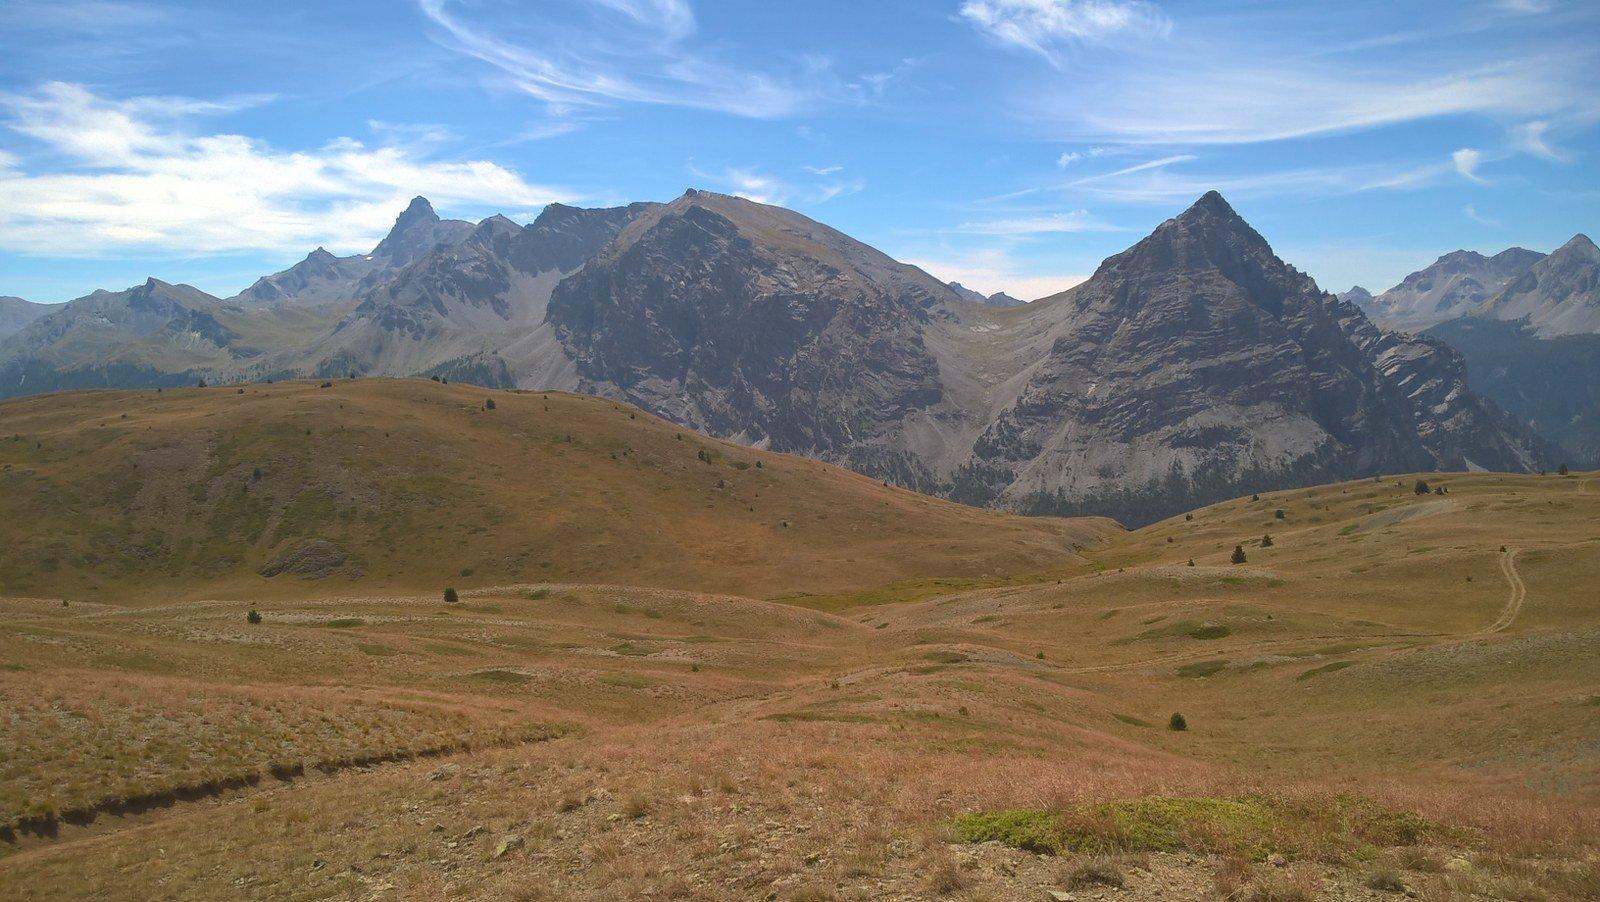 Girando intorno al Pic de Rochebrune